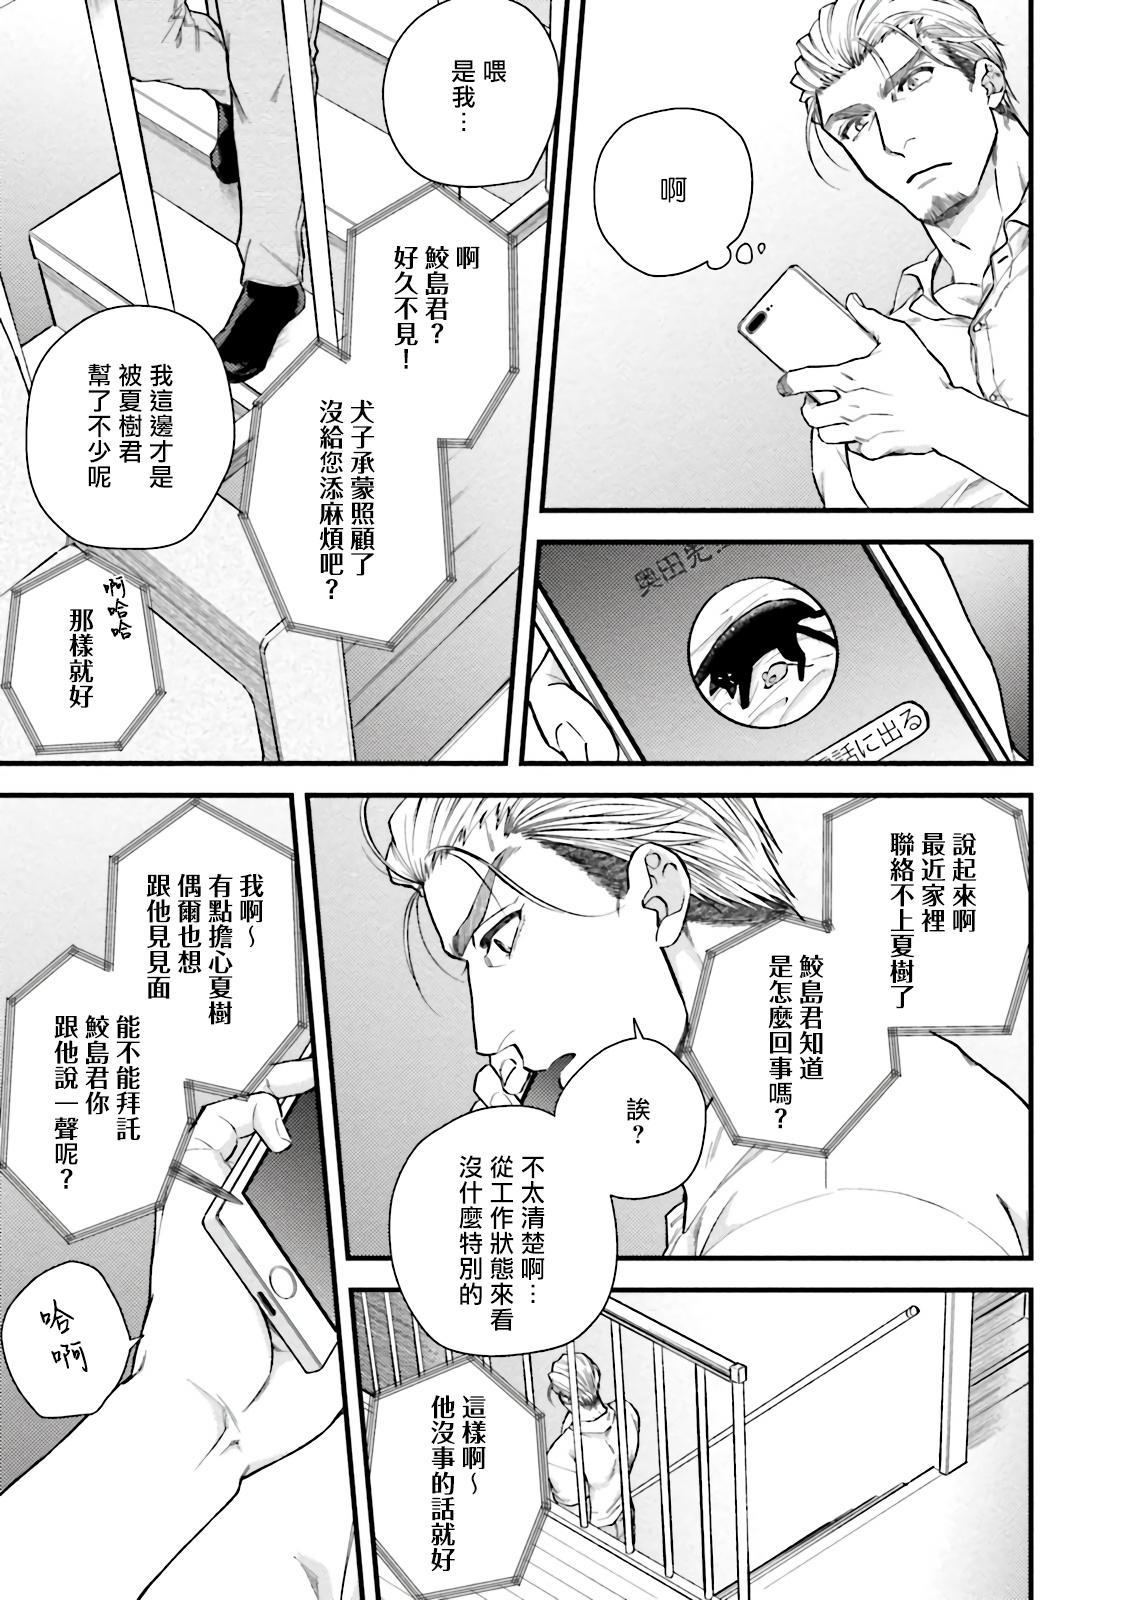 Kinou wa Otanoshimi Deshita ne | 昨天过得很愉快吧 Ch. 1-4+特典 61